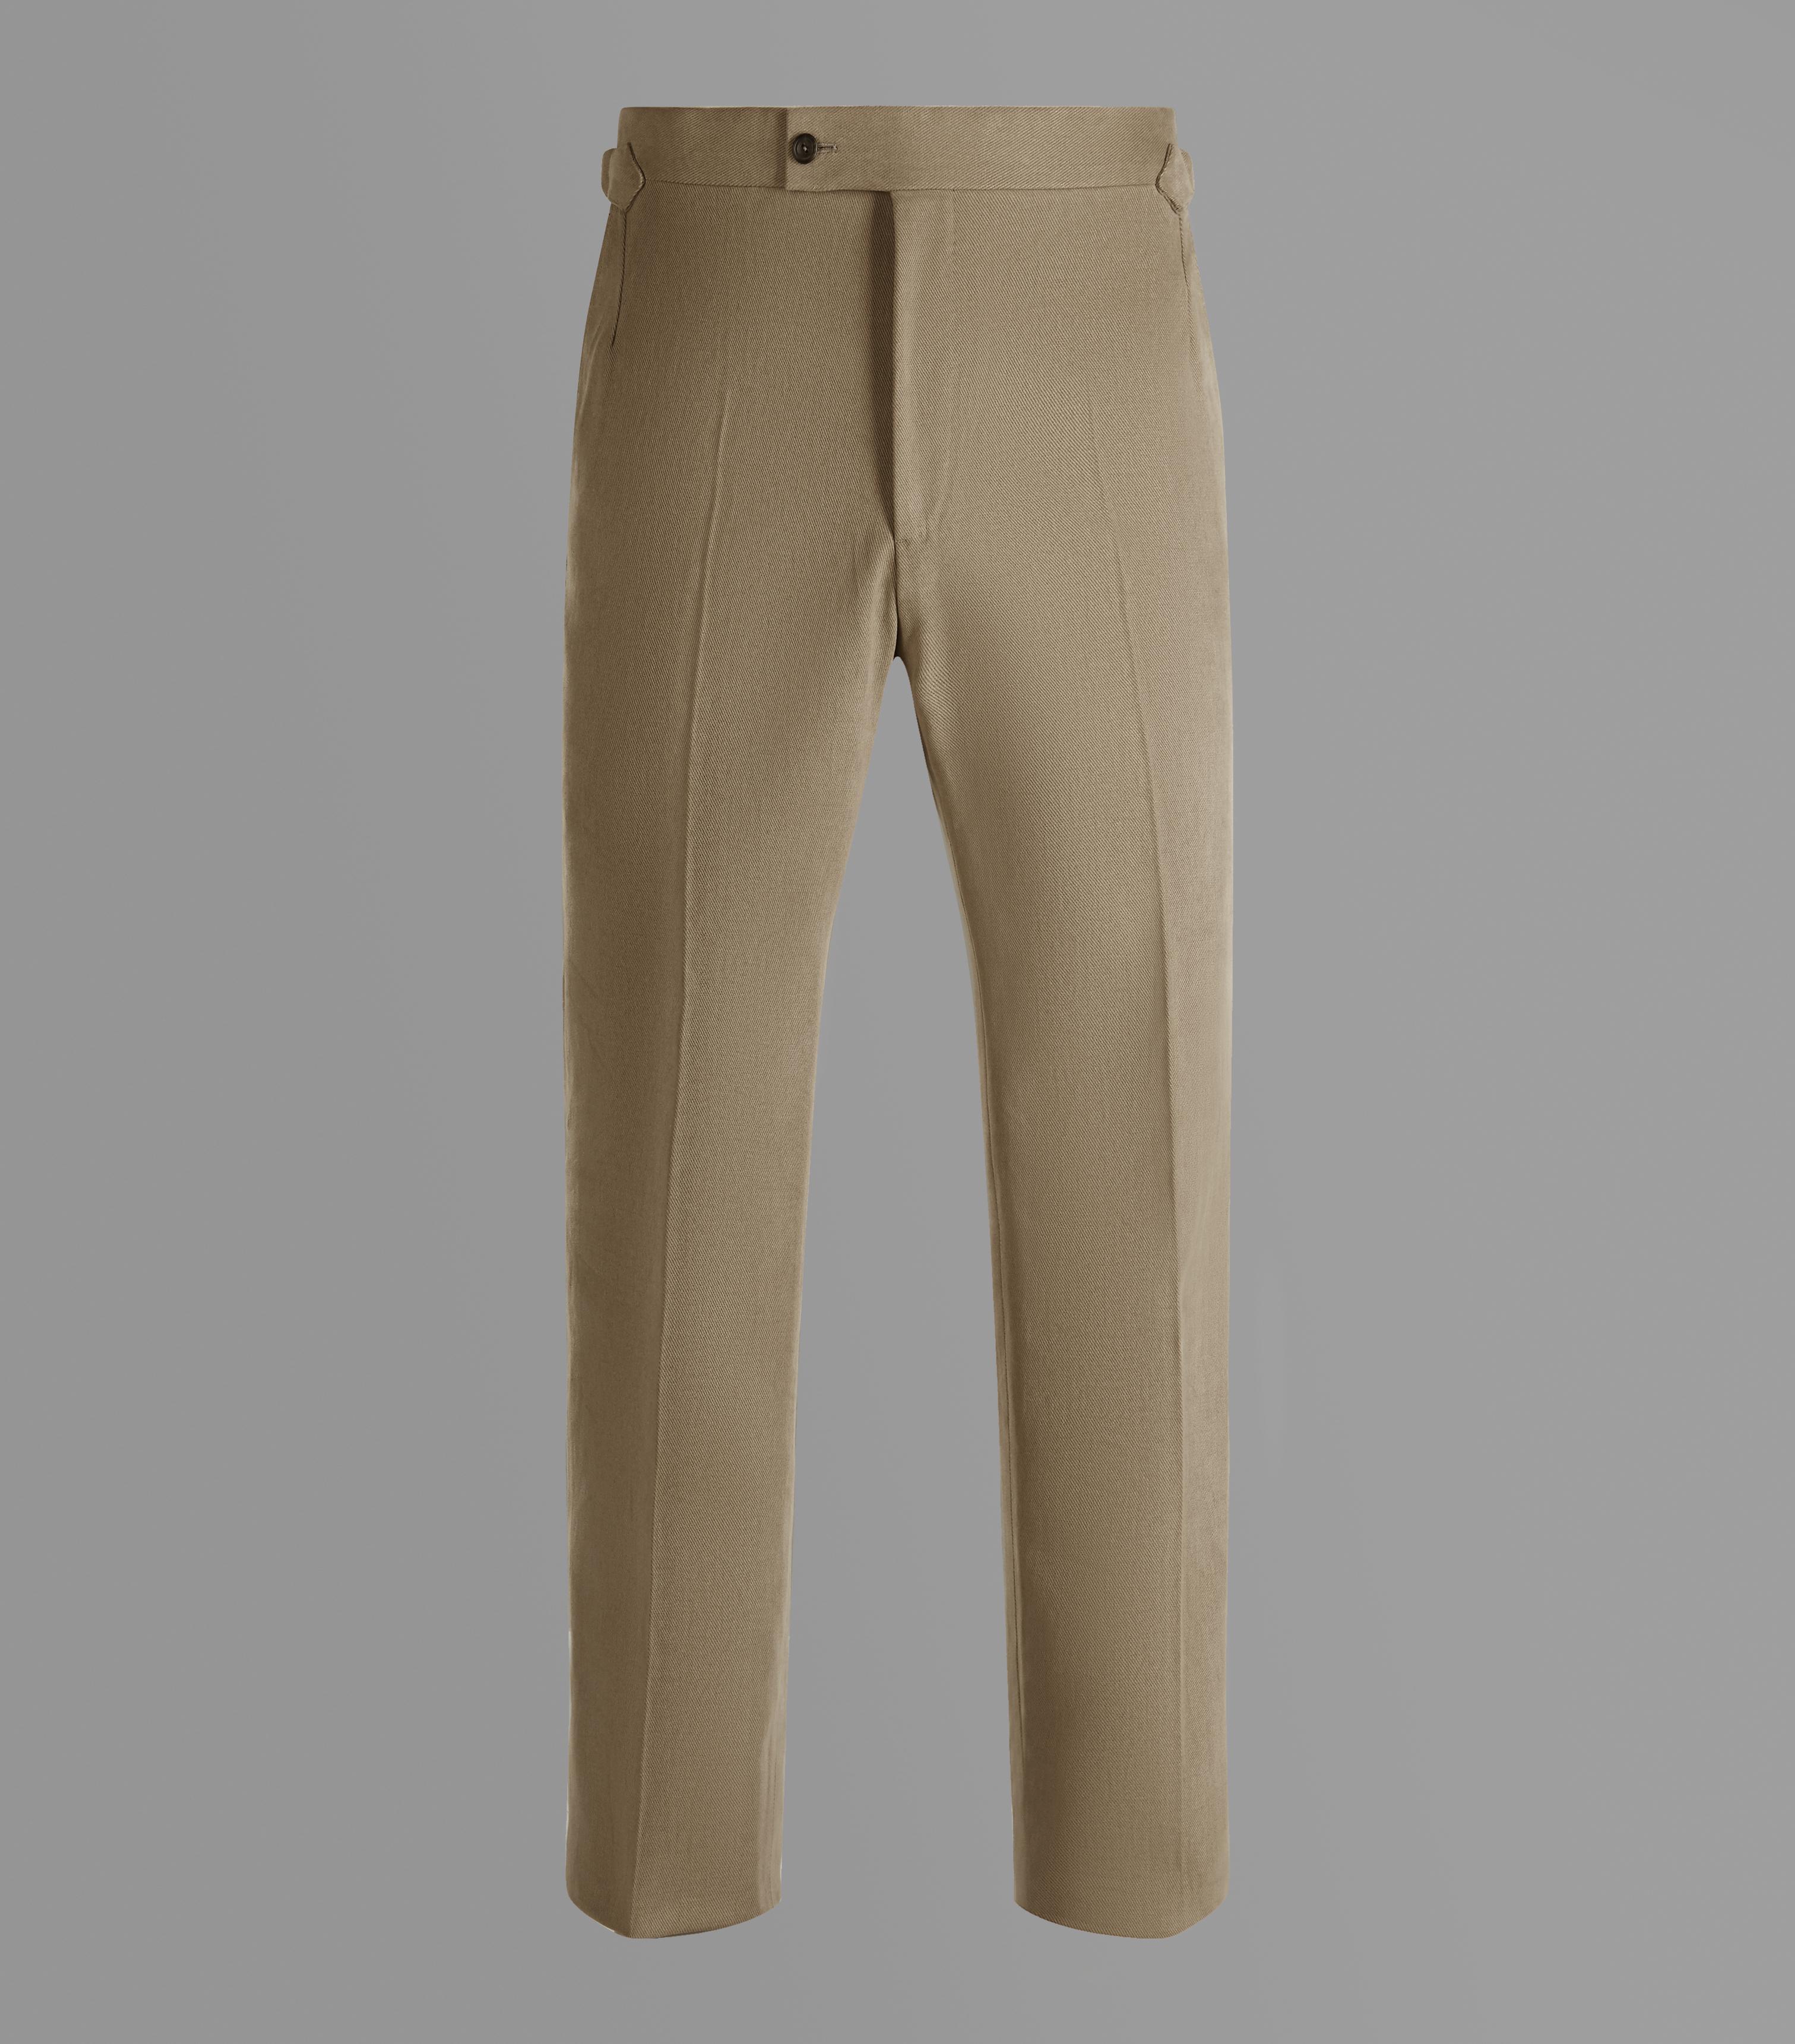 Huntsman Tan Brushed Cotton Trousers